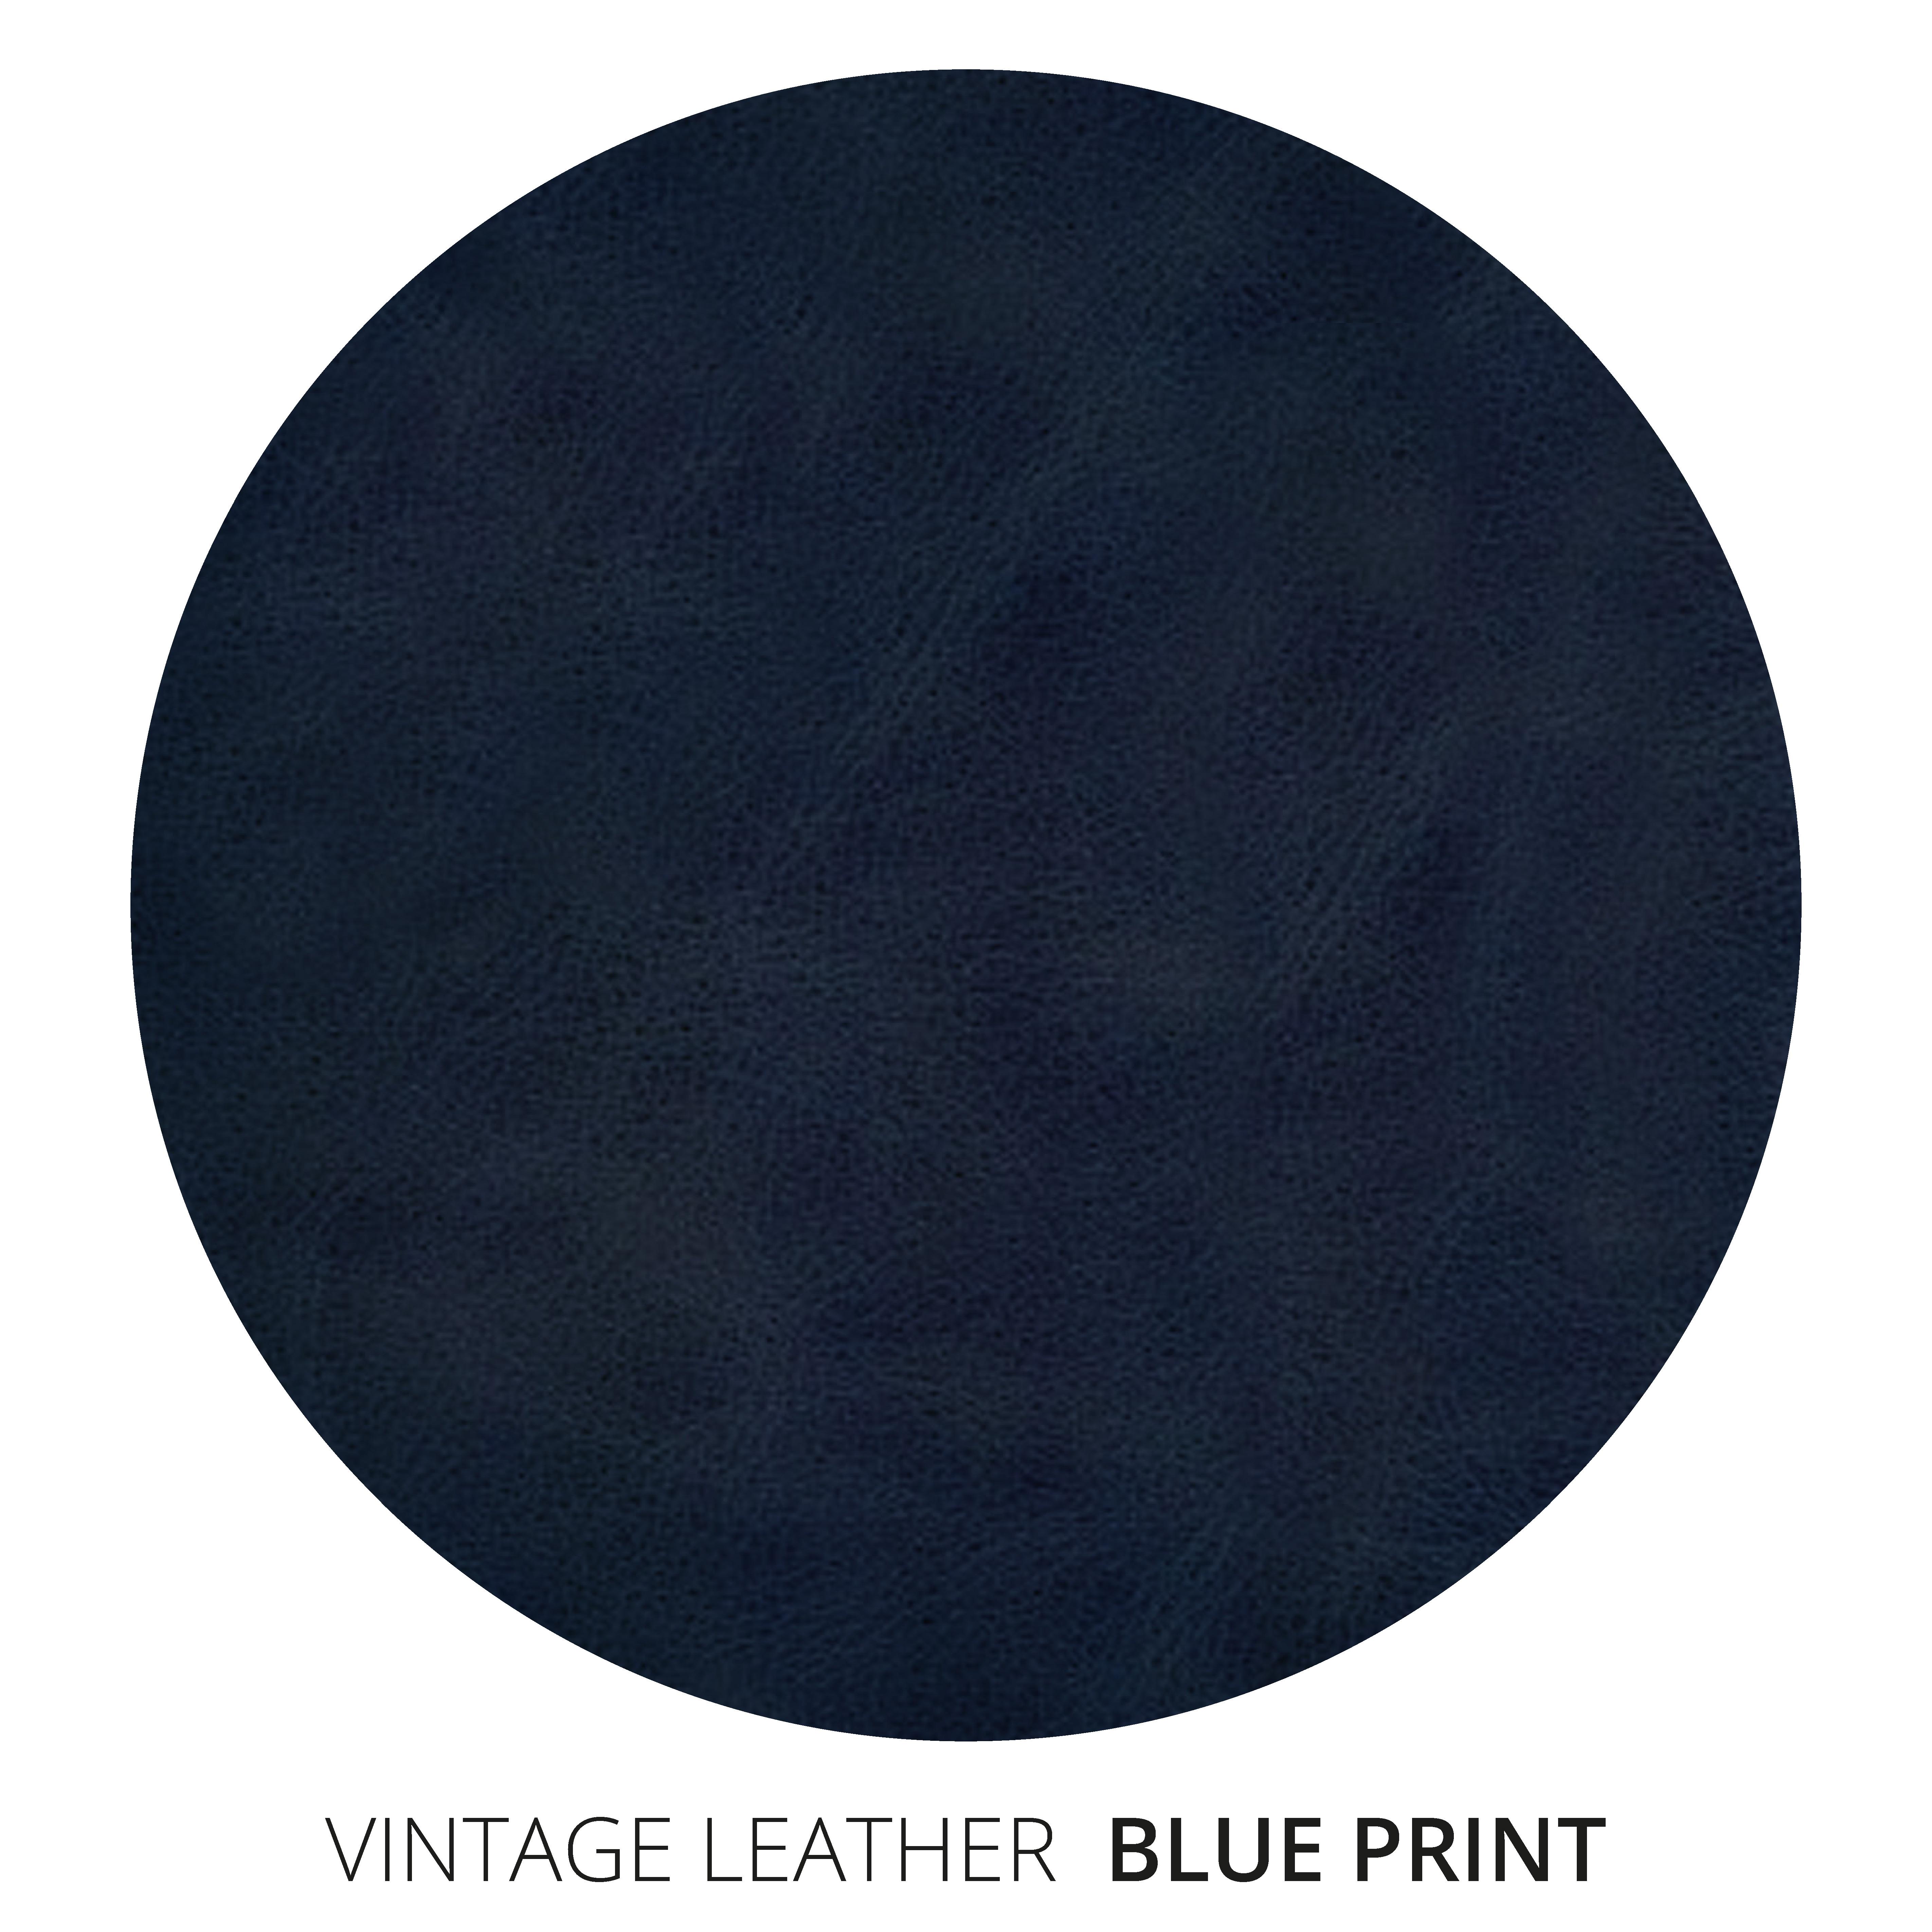 Blue Print Vintage Leather Swatch